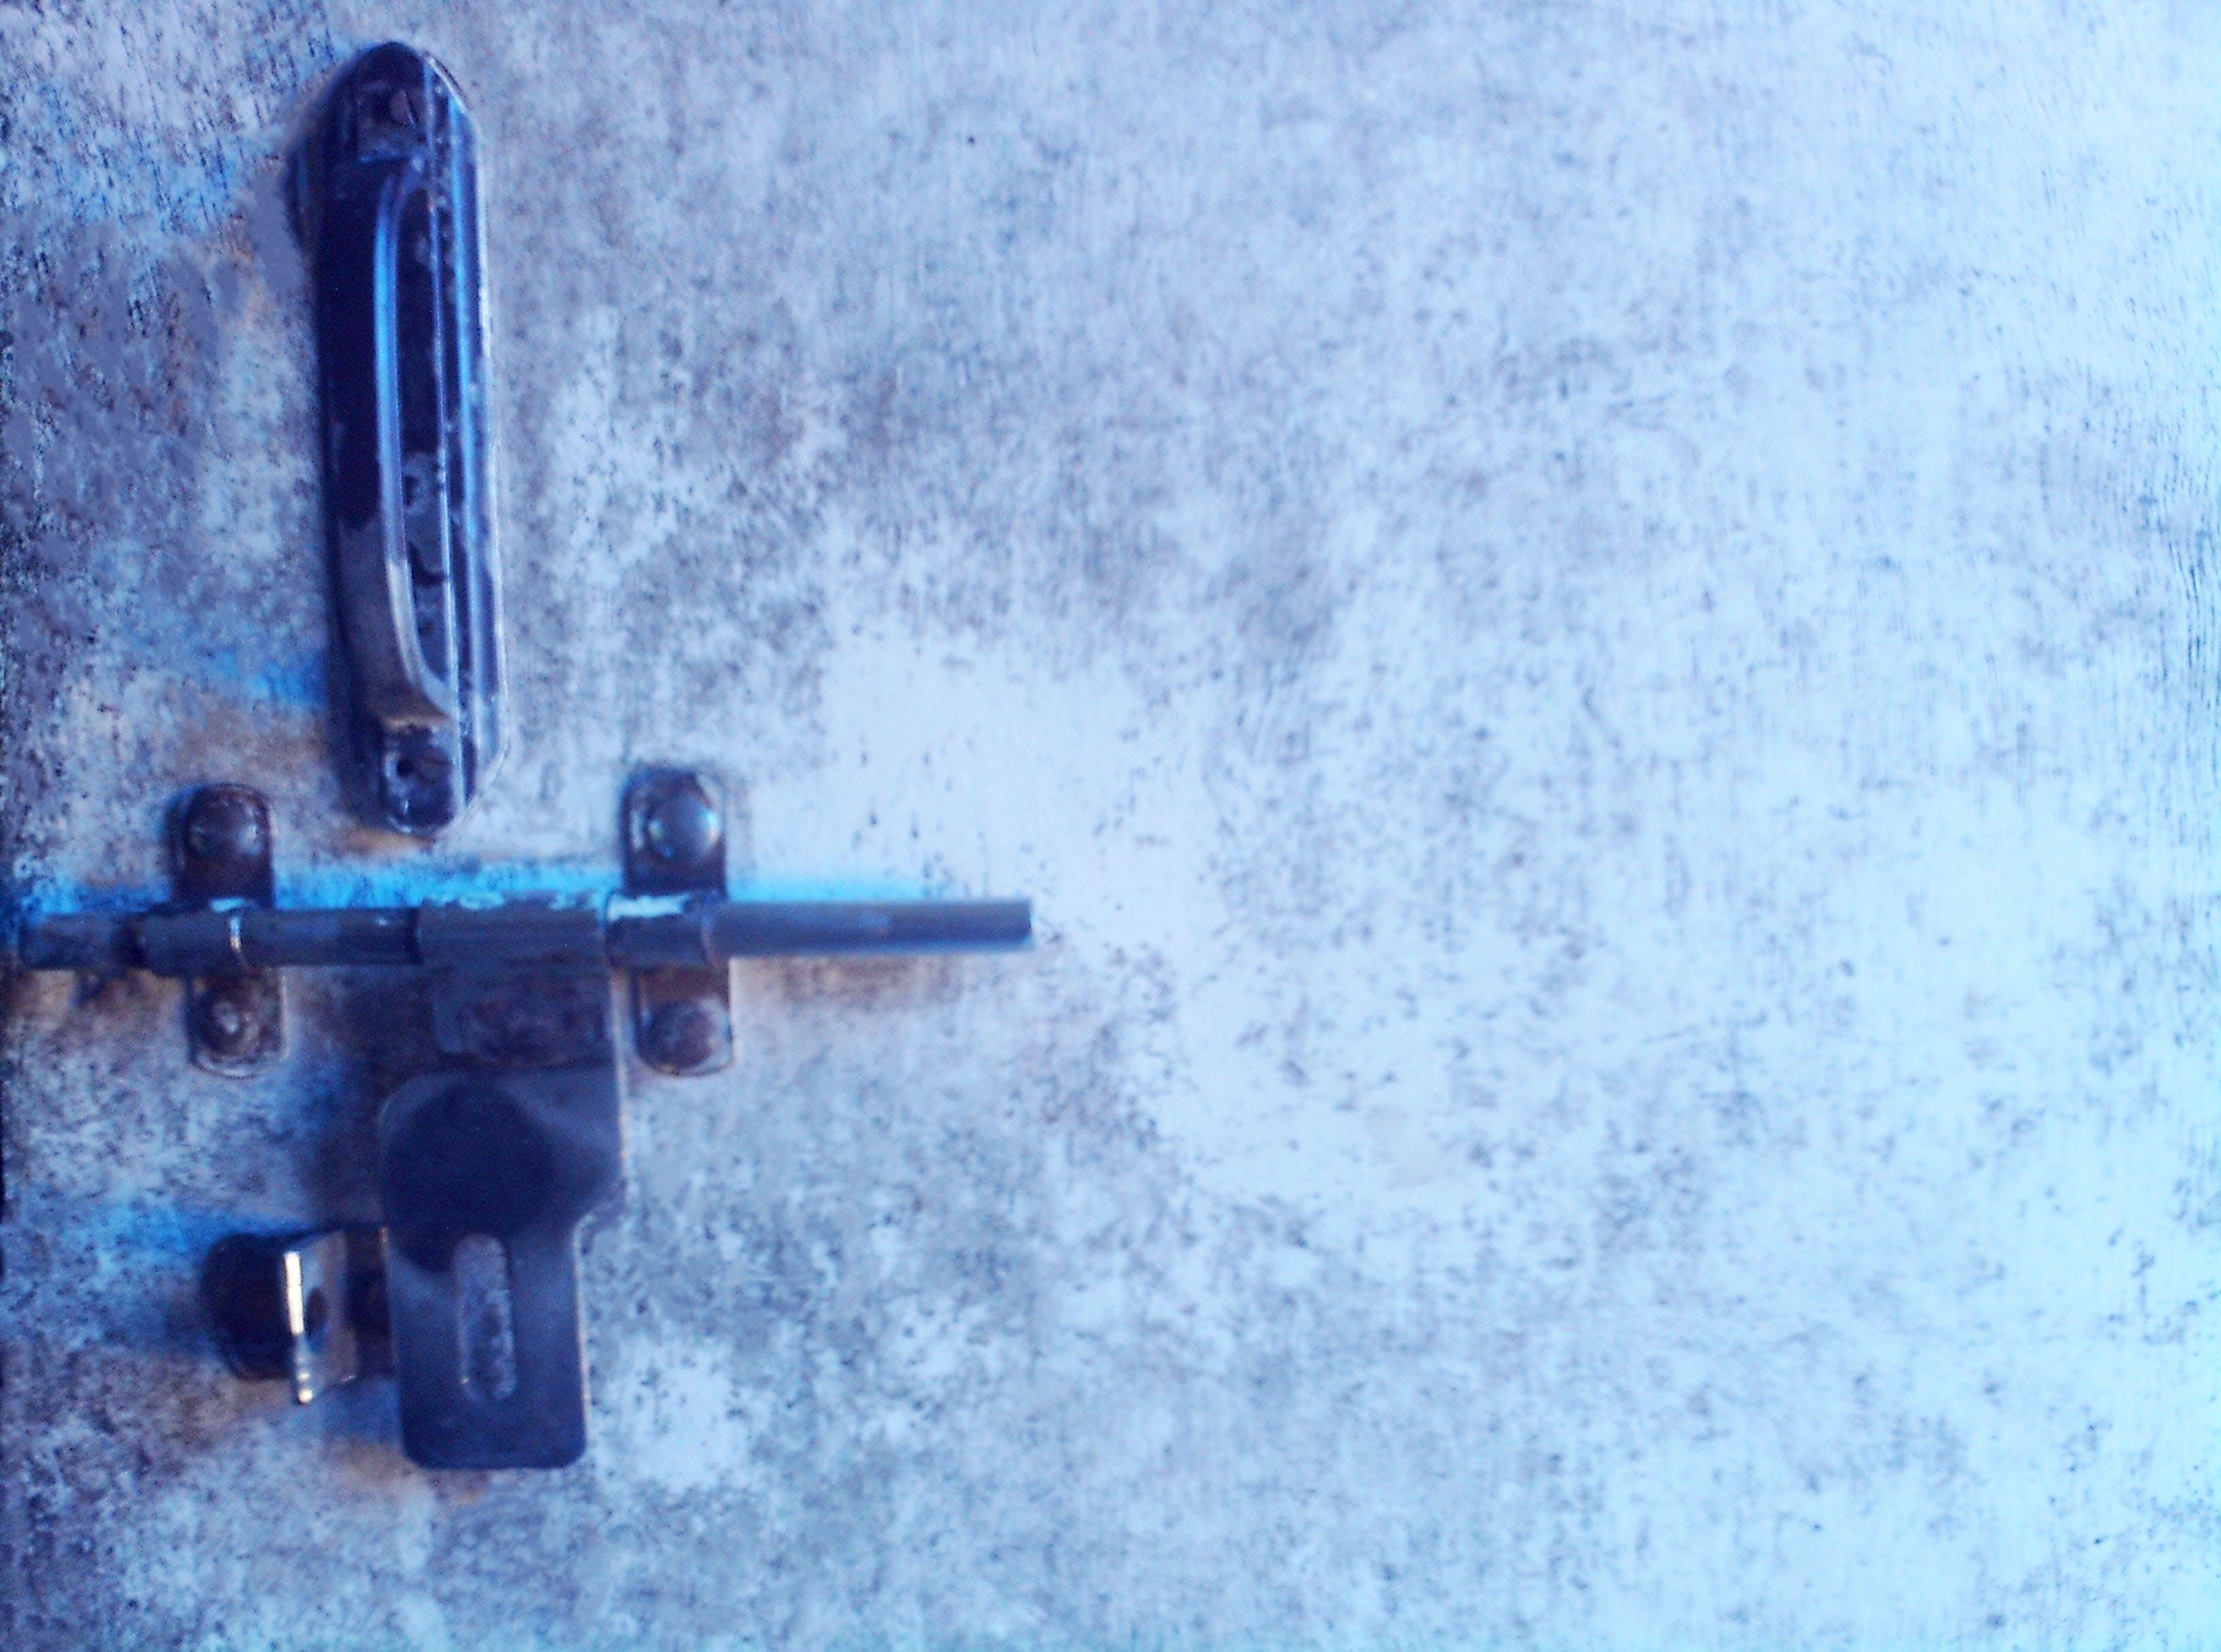 Free stock photo of lock, locks, old lock